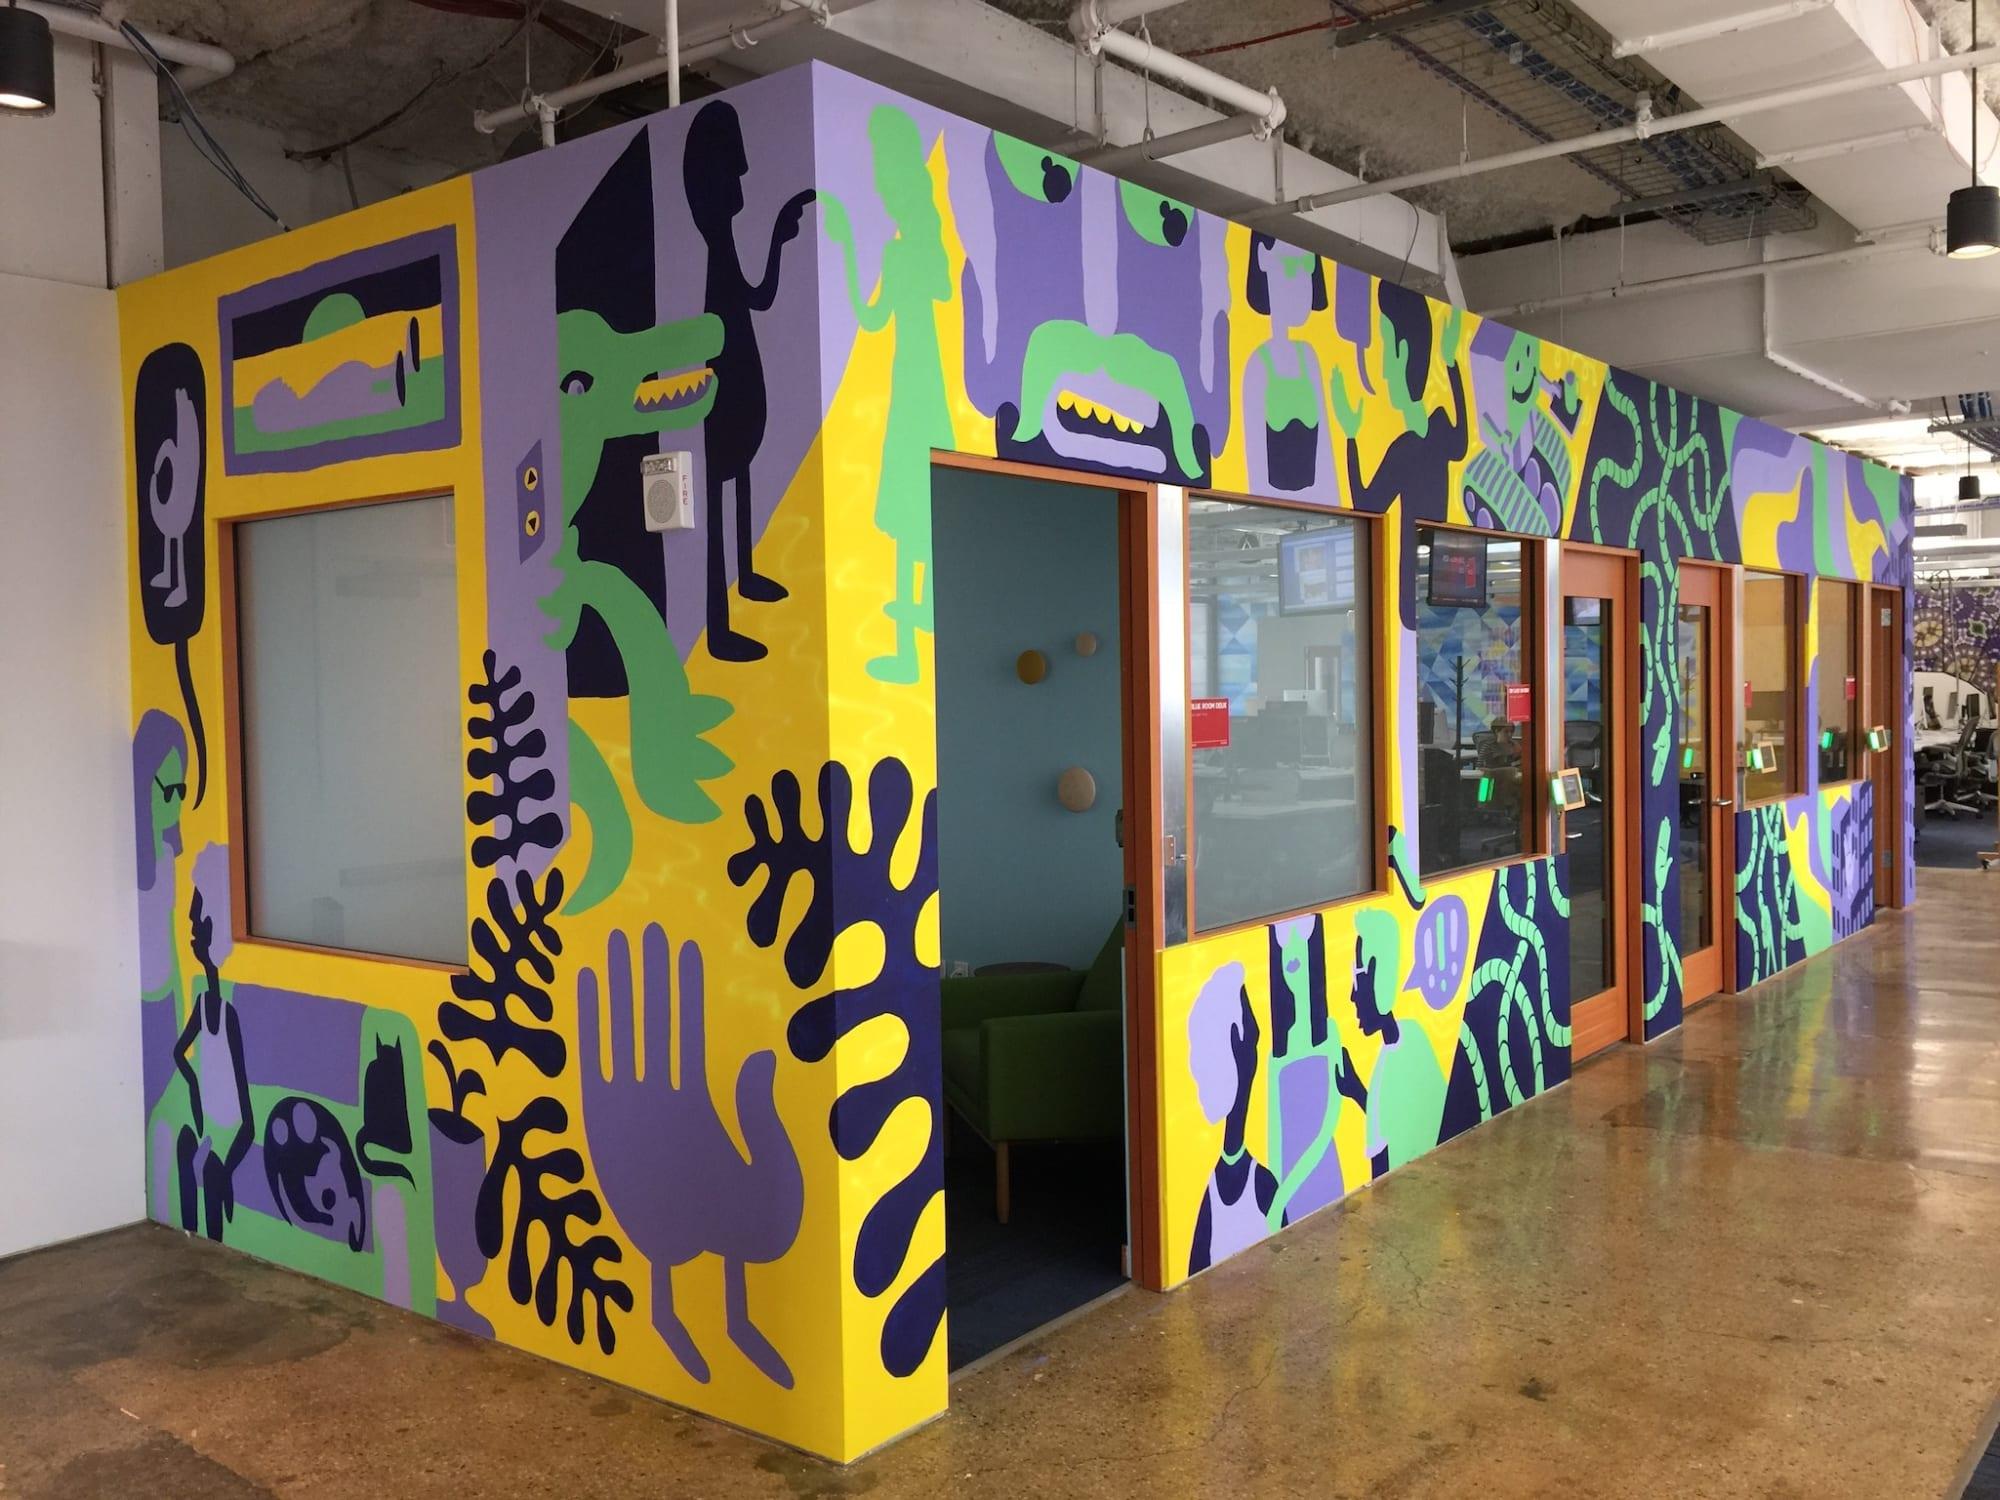 Murals by Edward Ubiera seen at Facebook, New York, Astor Place, New York - Future City